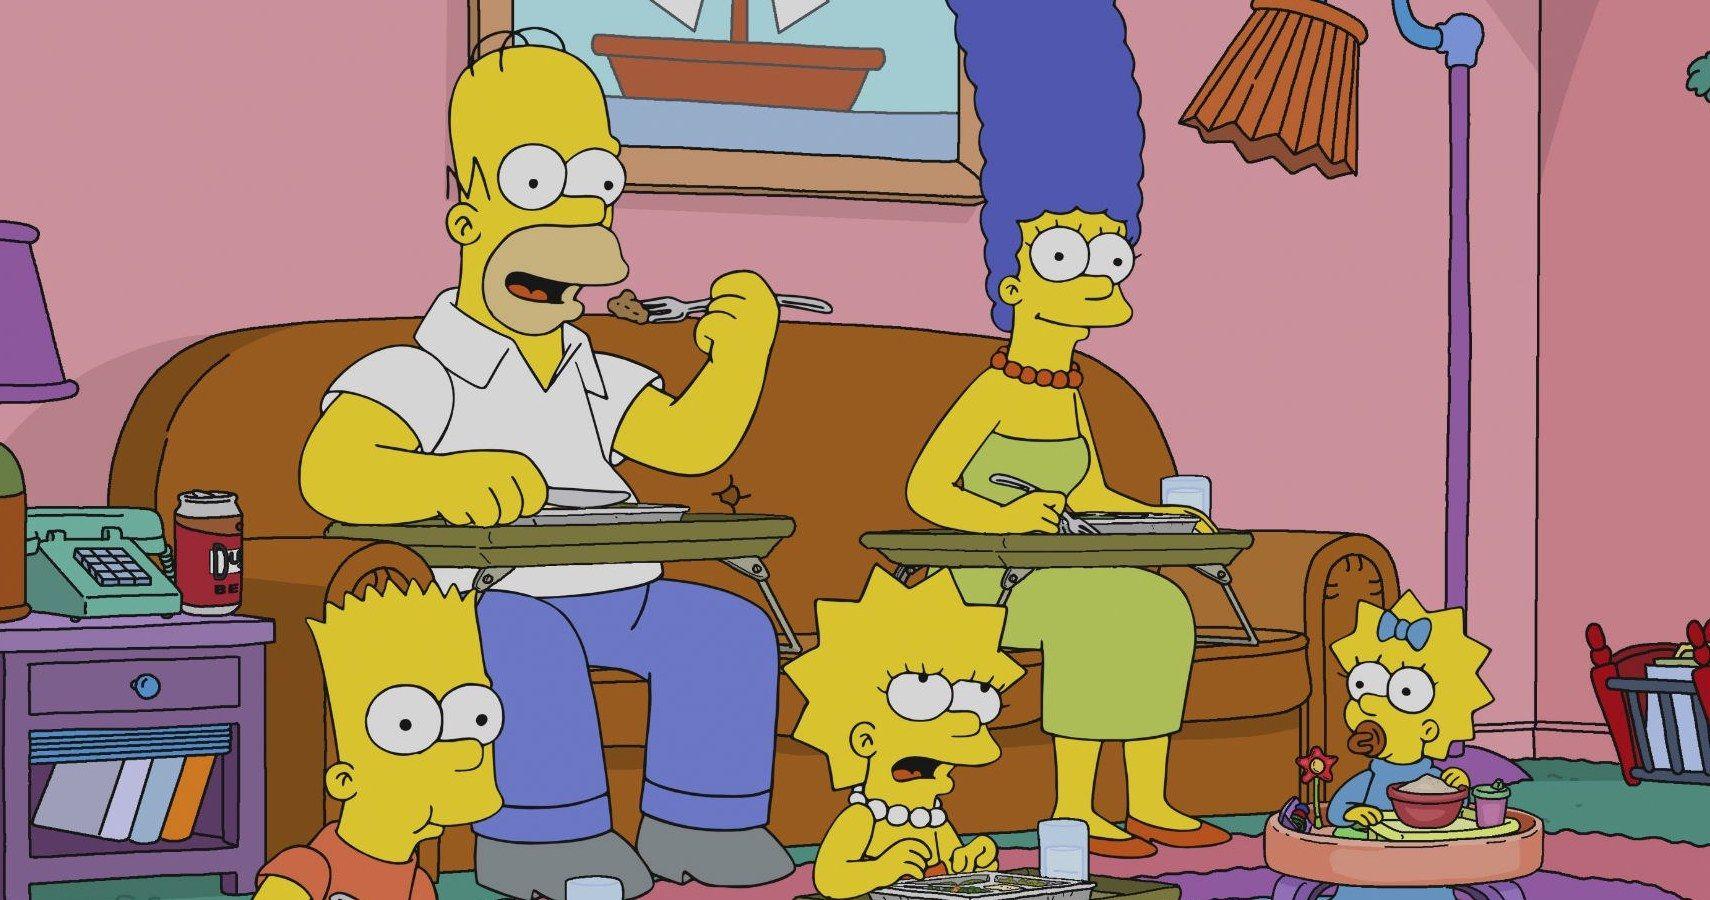 Simpsons-Future-Featured-Image